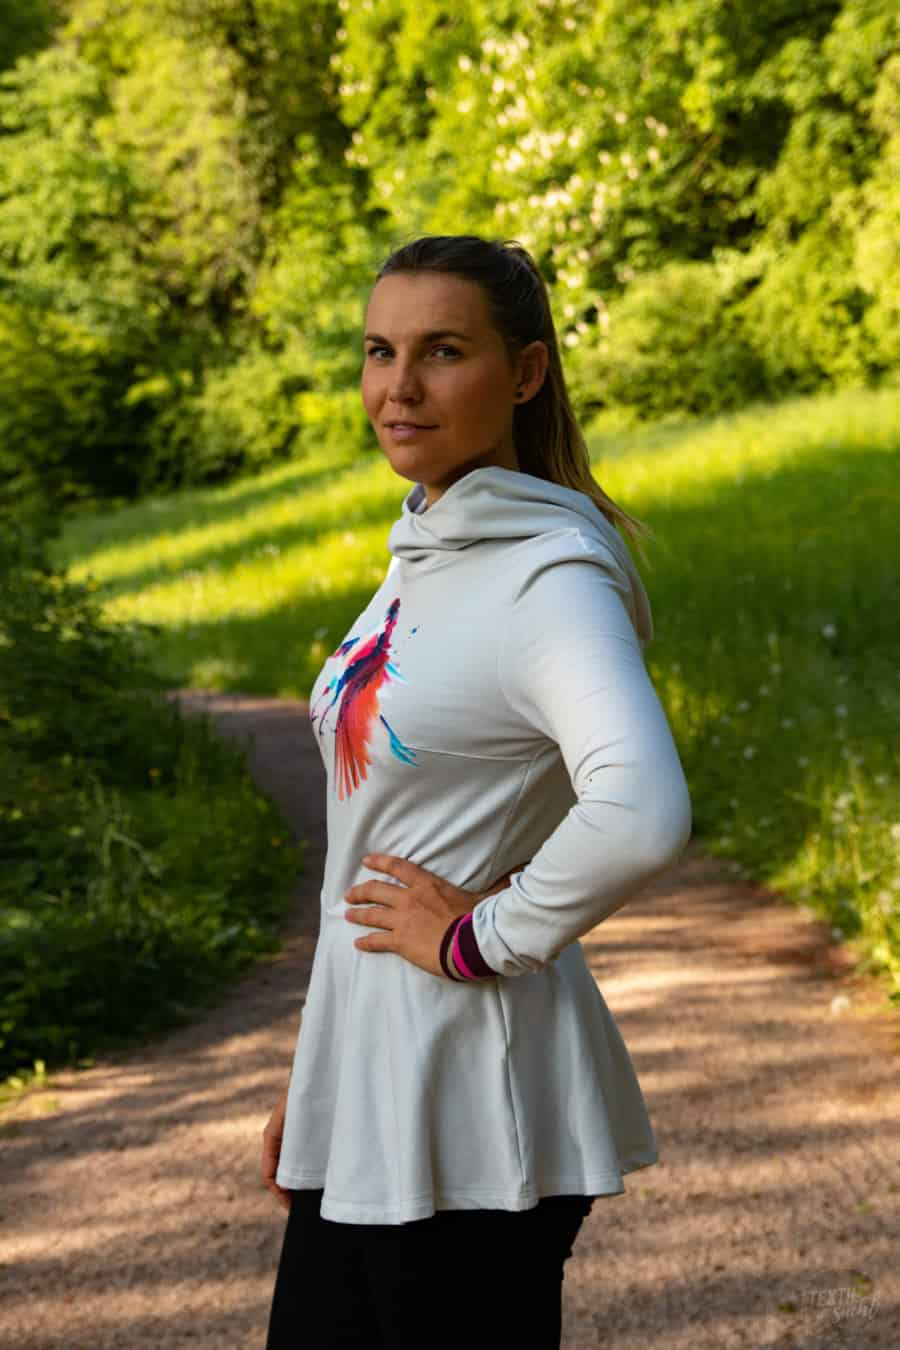 Schnittmuster Volant Shirt Nastja 2.0 für Frauen